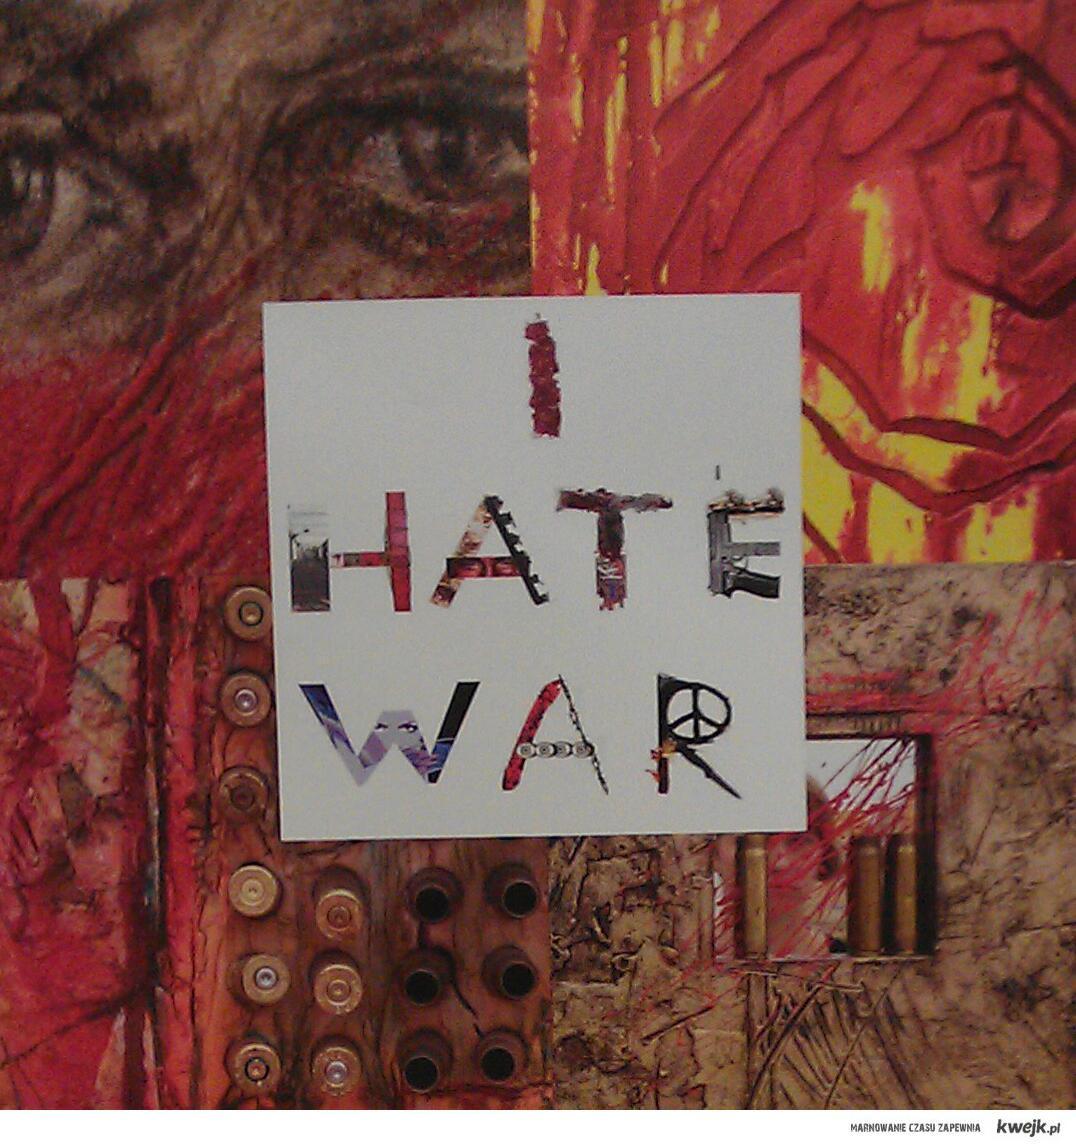 hatewar